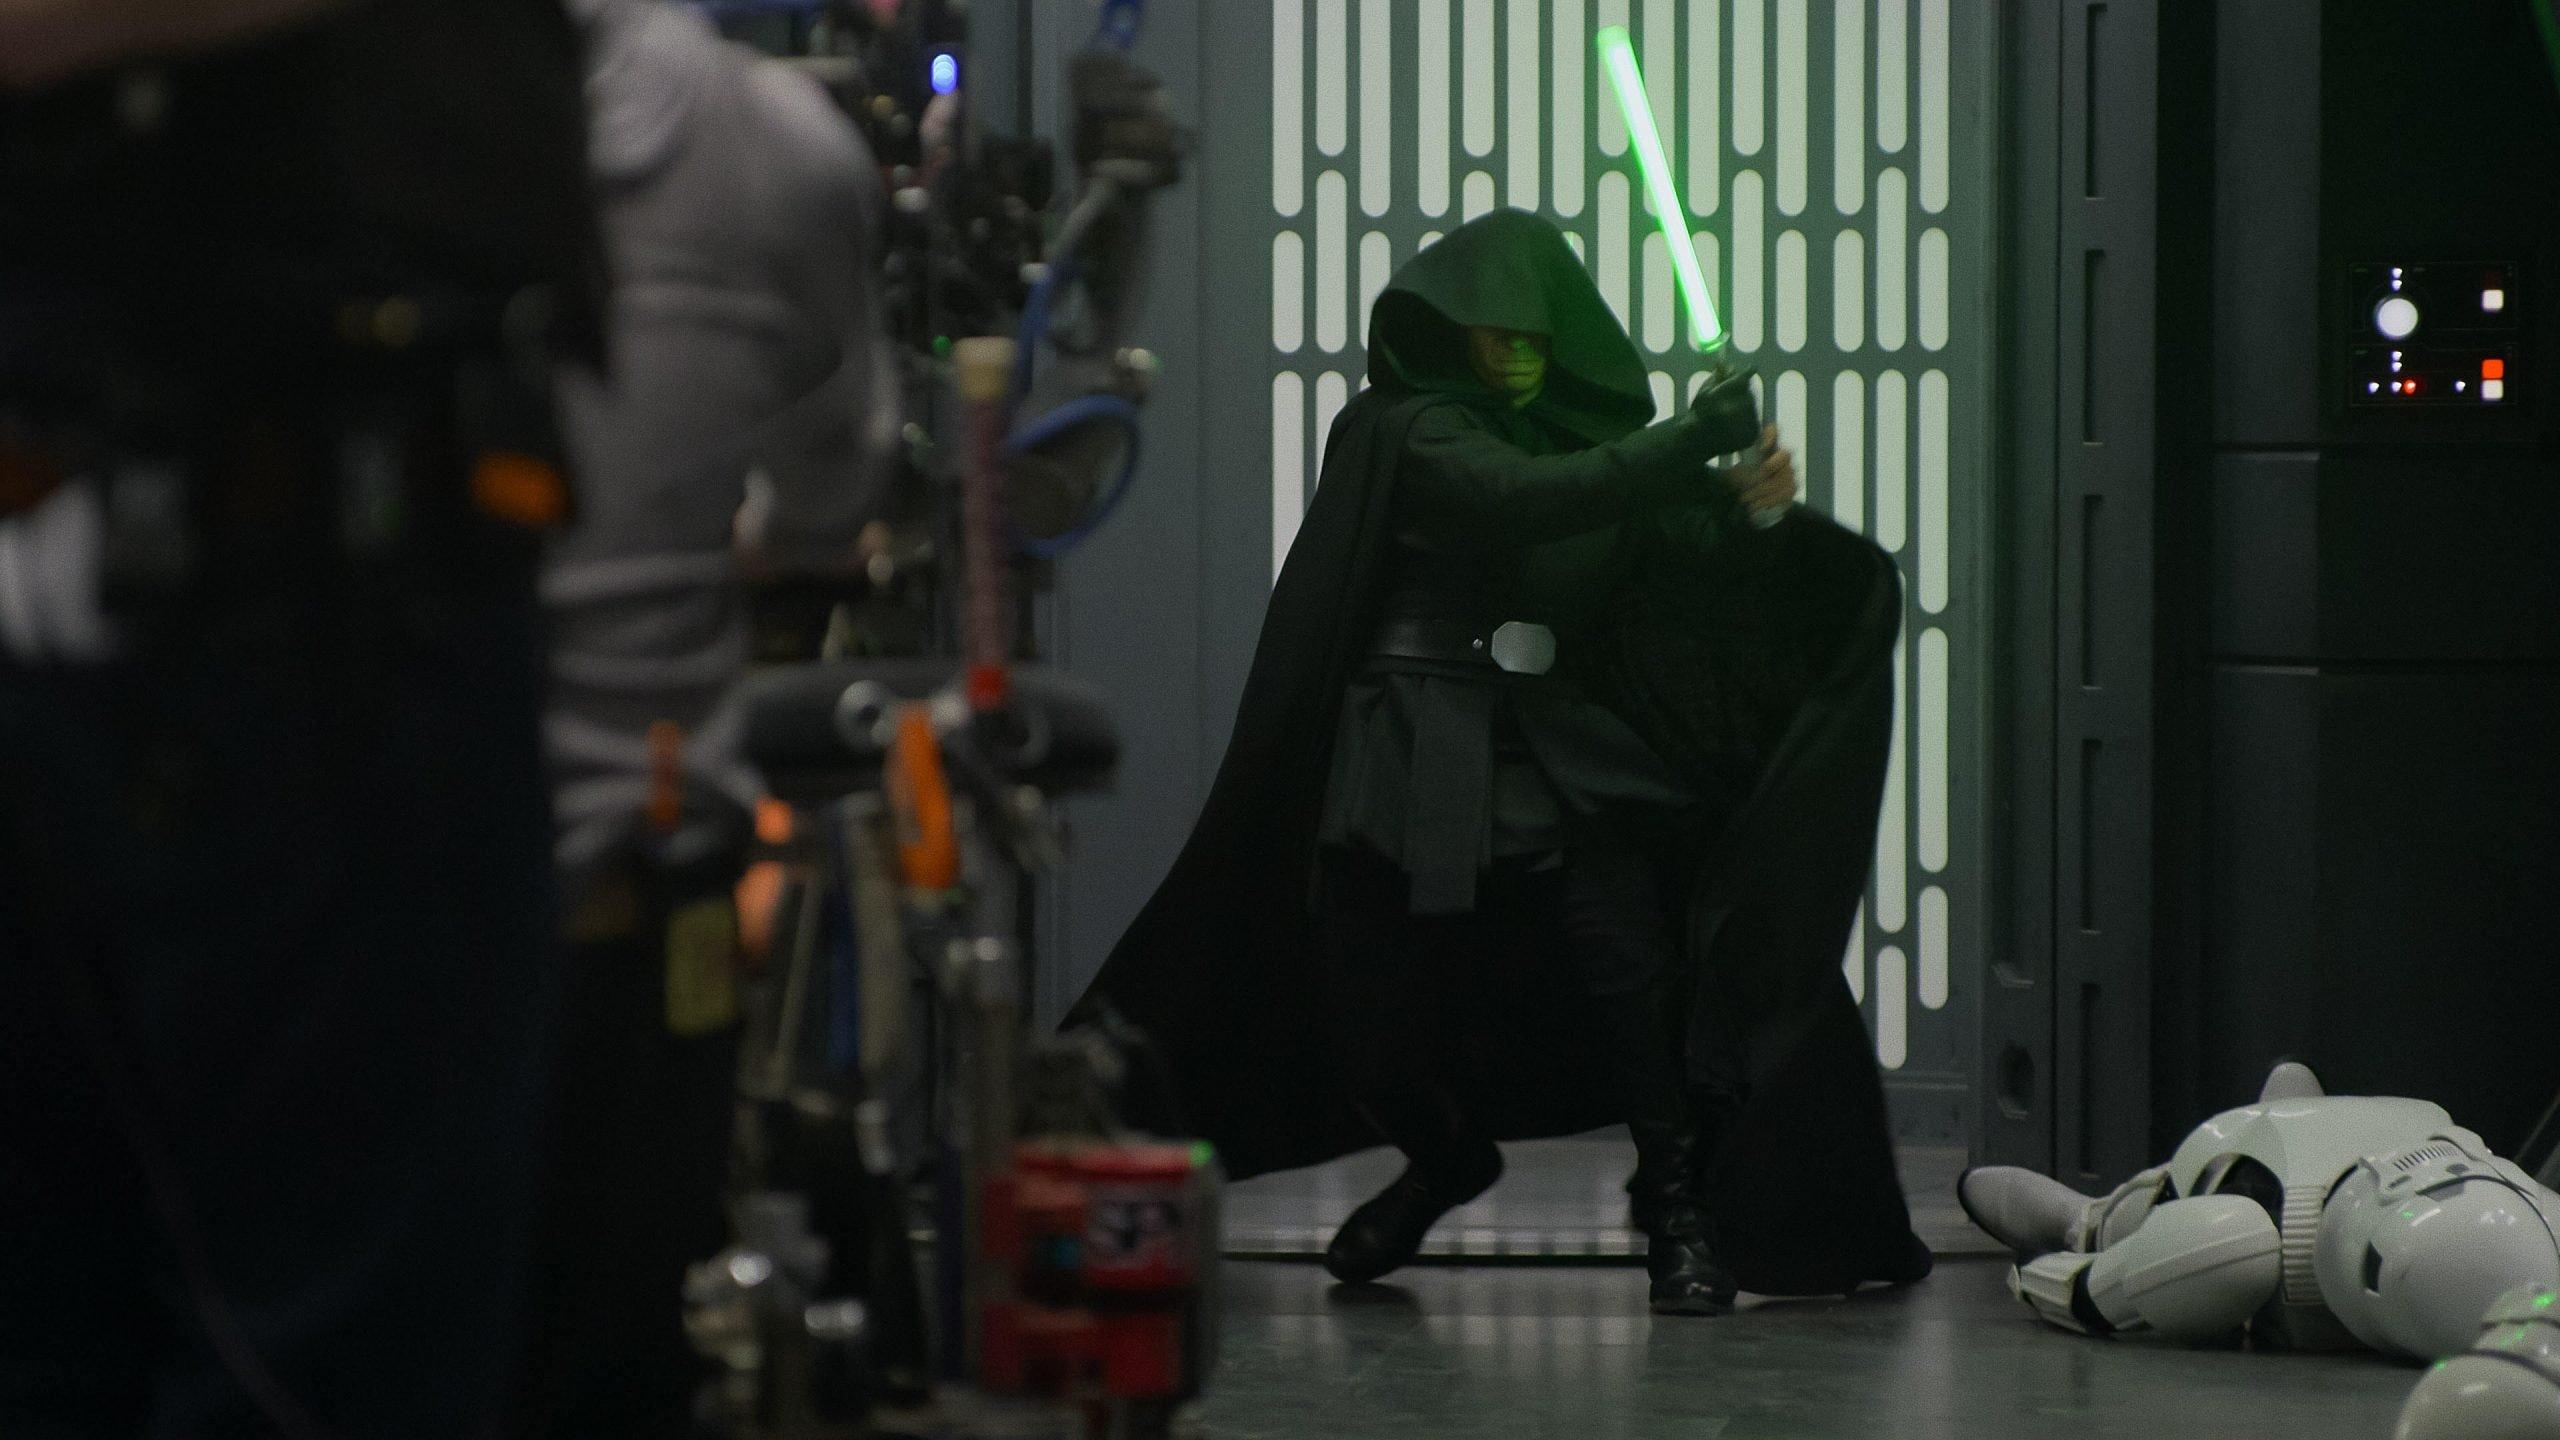 Behind the scenes photo of The Mandalorian season 2 finale